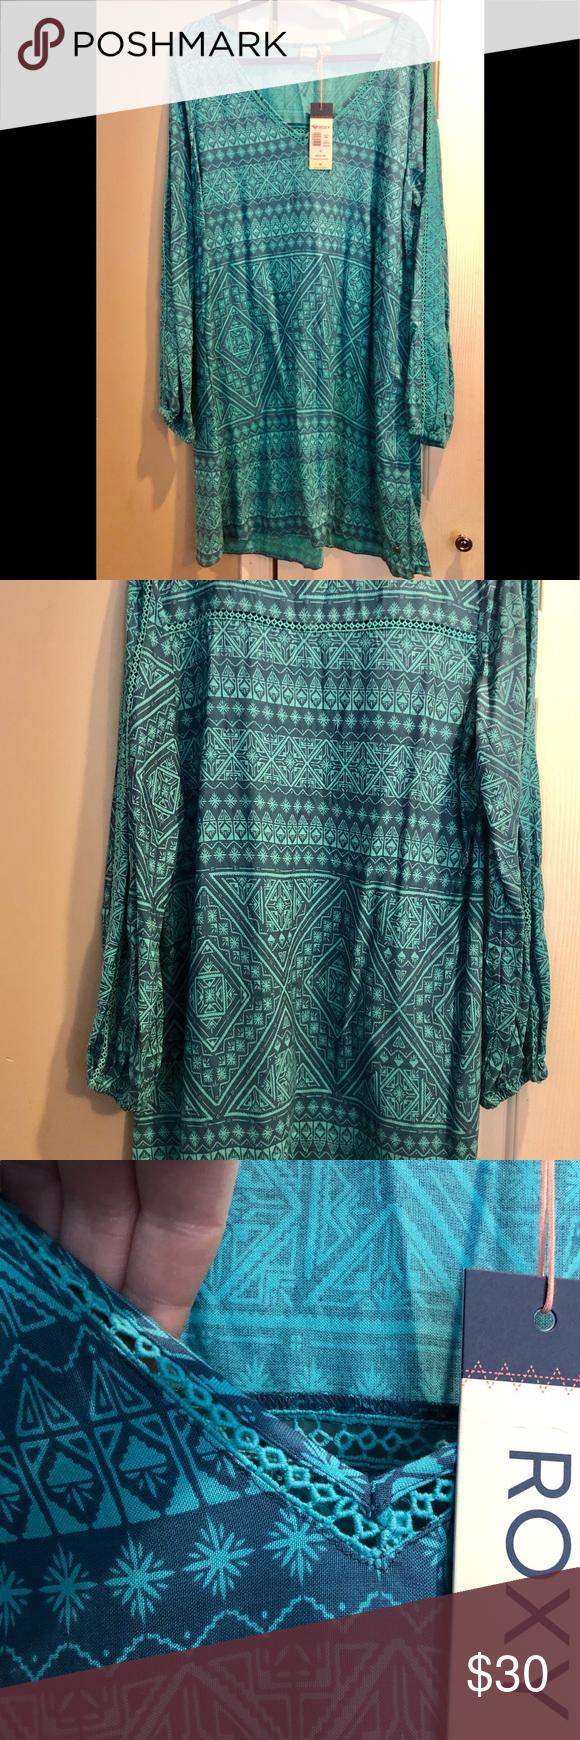 80e1011d0b NWT! Roxy April Morning Long Sleeve Dress, Size XL Adorable! Breezy shift/